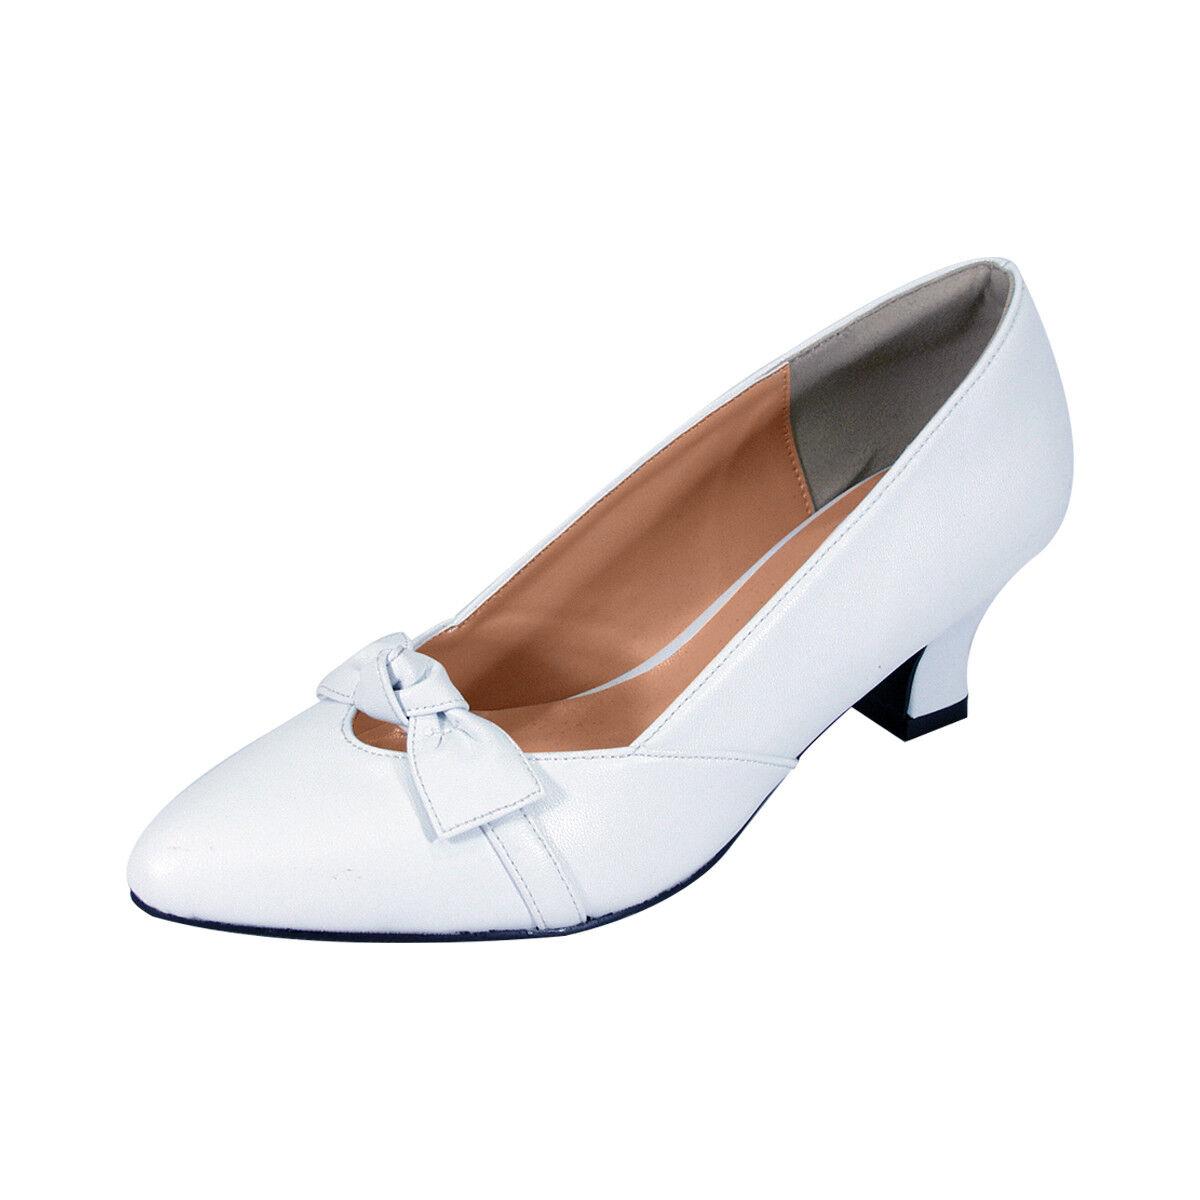 PEERAGE Belle Wouomo Wide Width Elegant Bow Accented Dress Dress Dress Pump e85c79